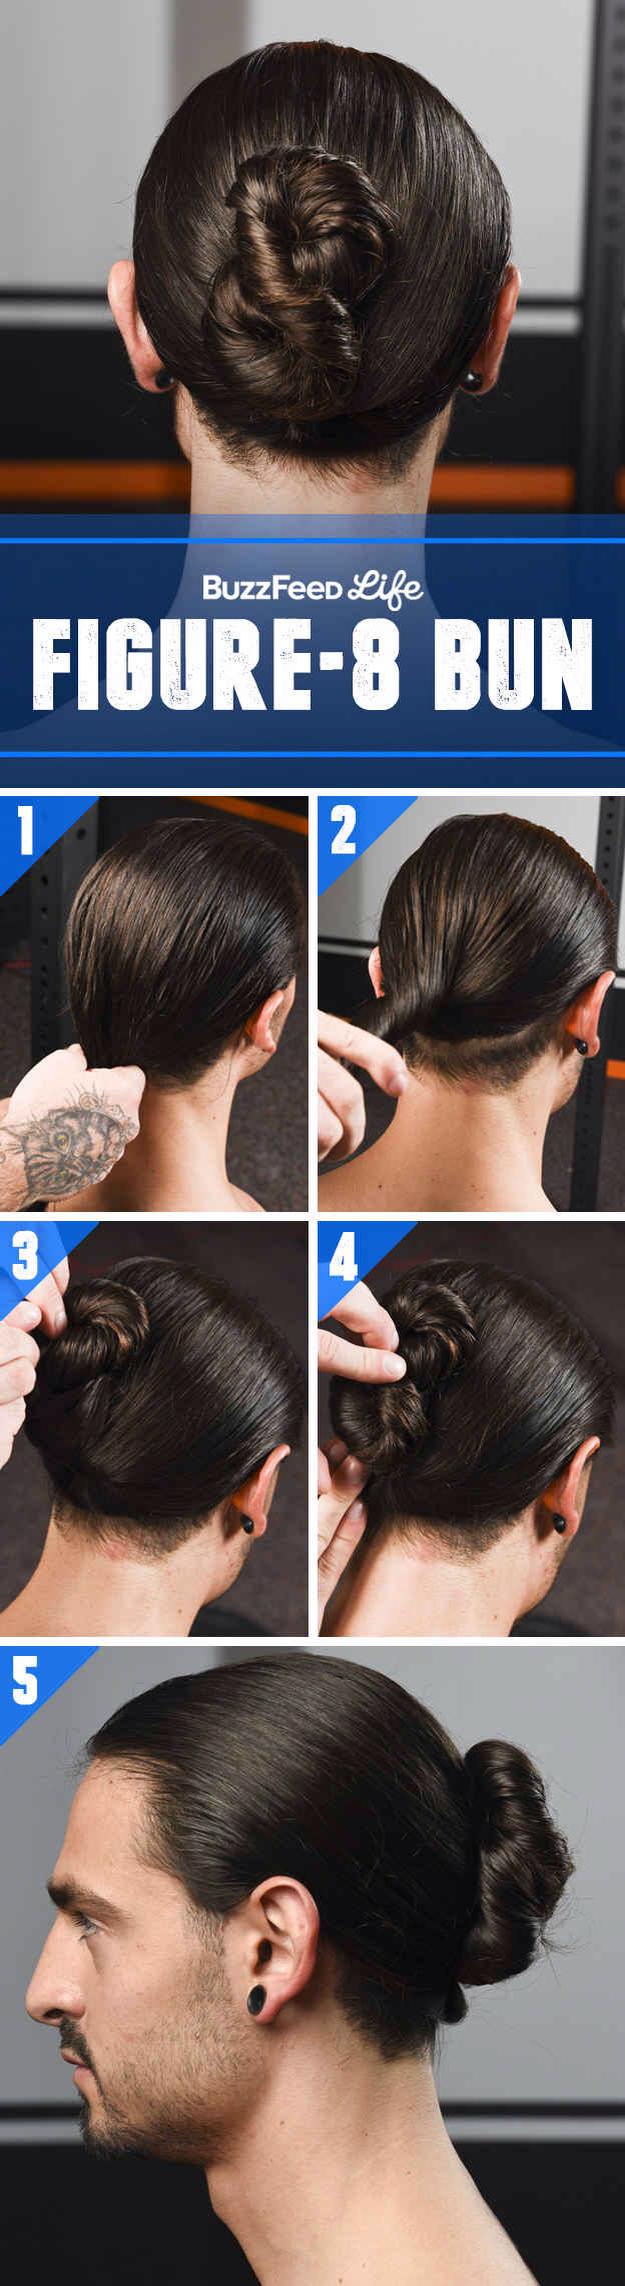 Pin by Jaime Turgeon on Hair  Pinterest